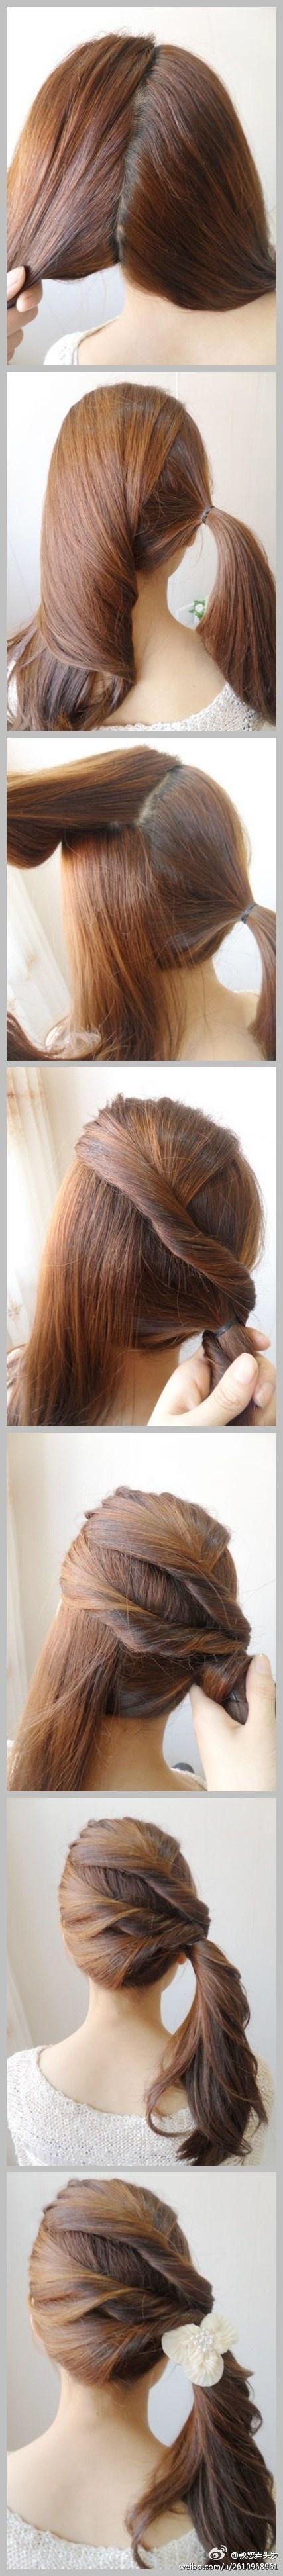 Three twists to side ponytail